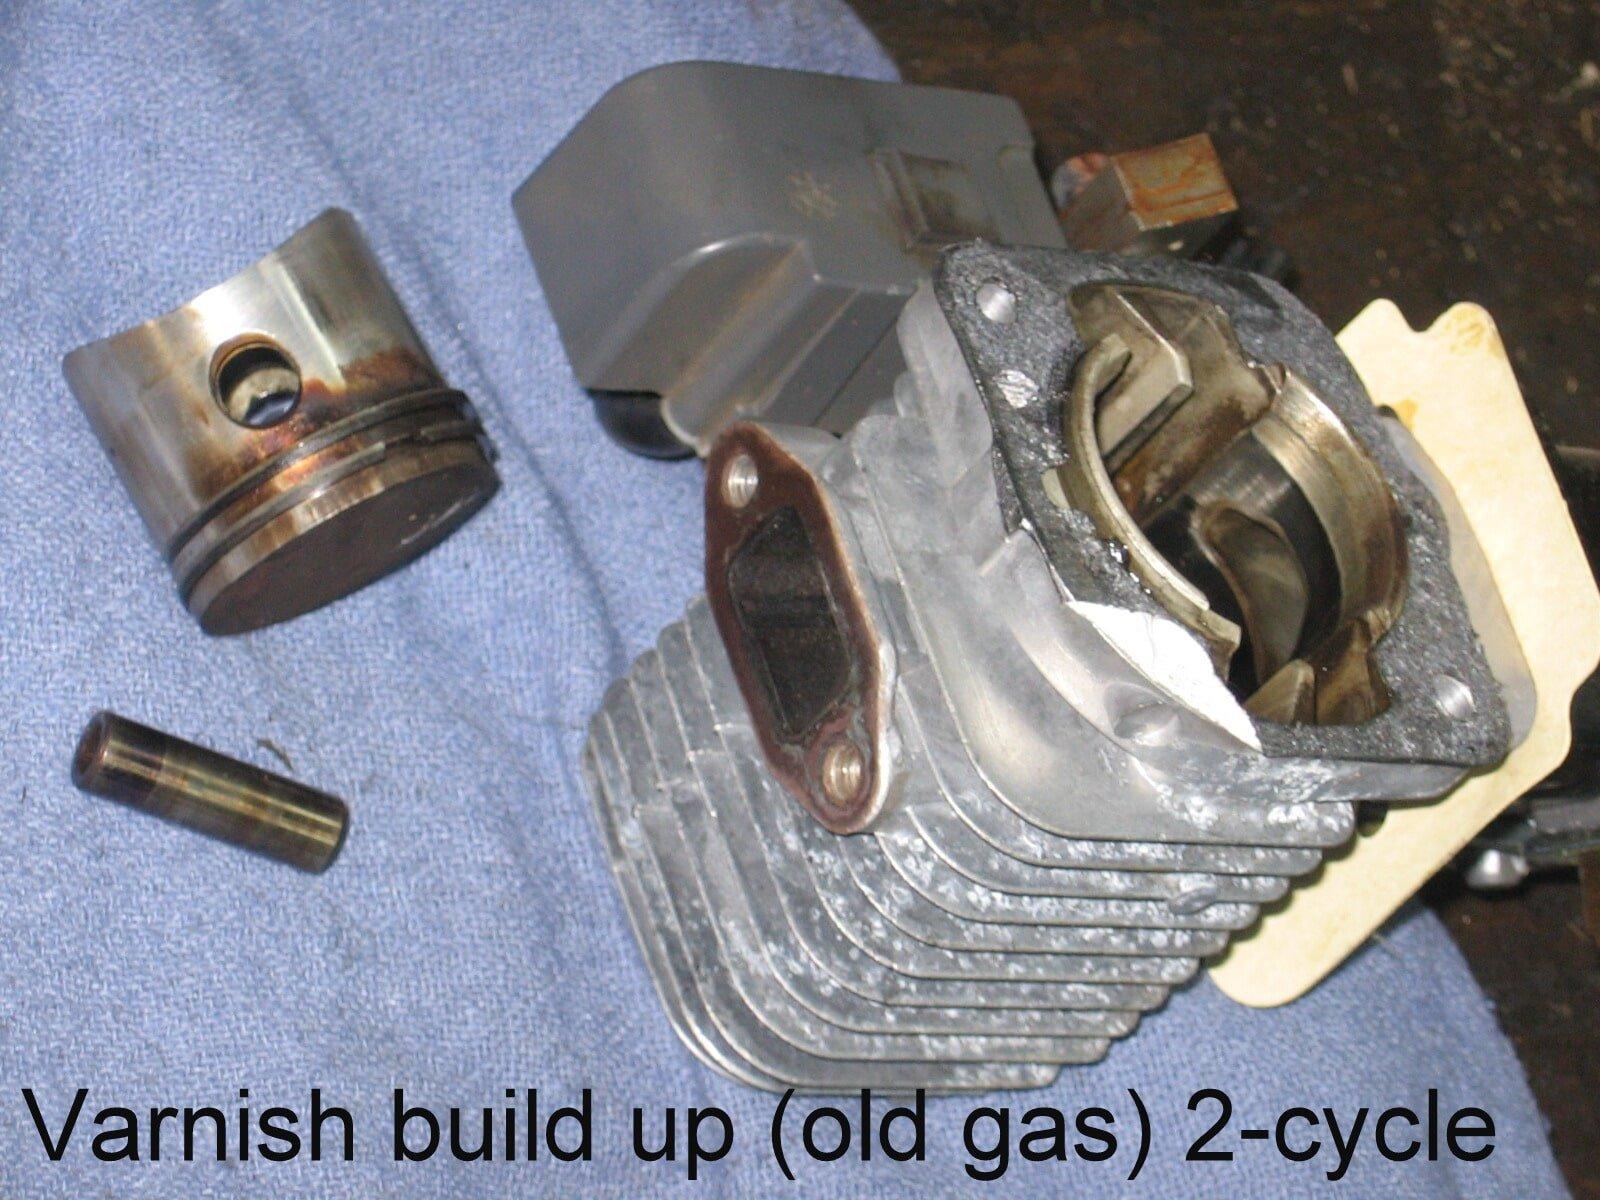 Lawn Mower Repair Bremerton Wa Small Engine Clinic